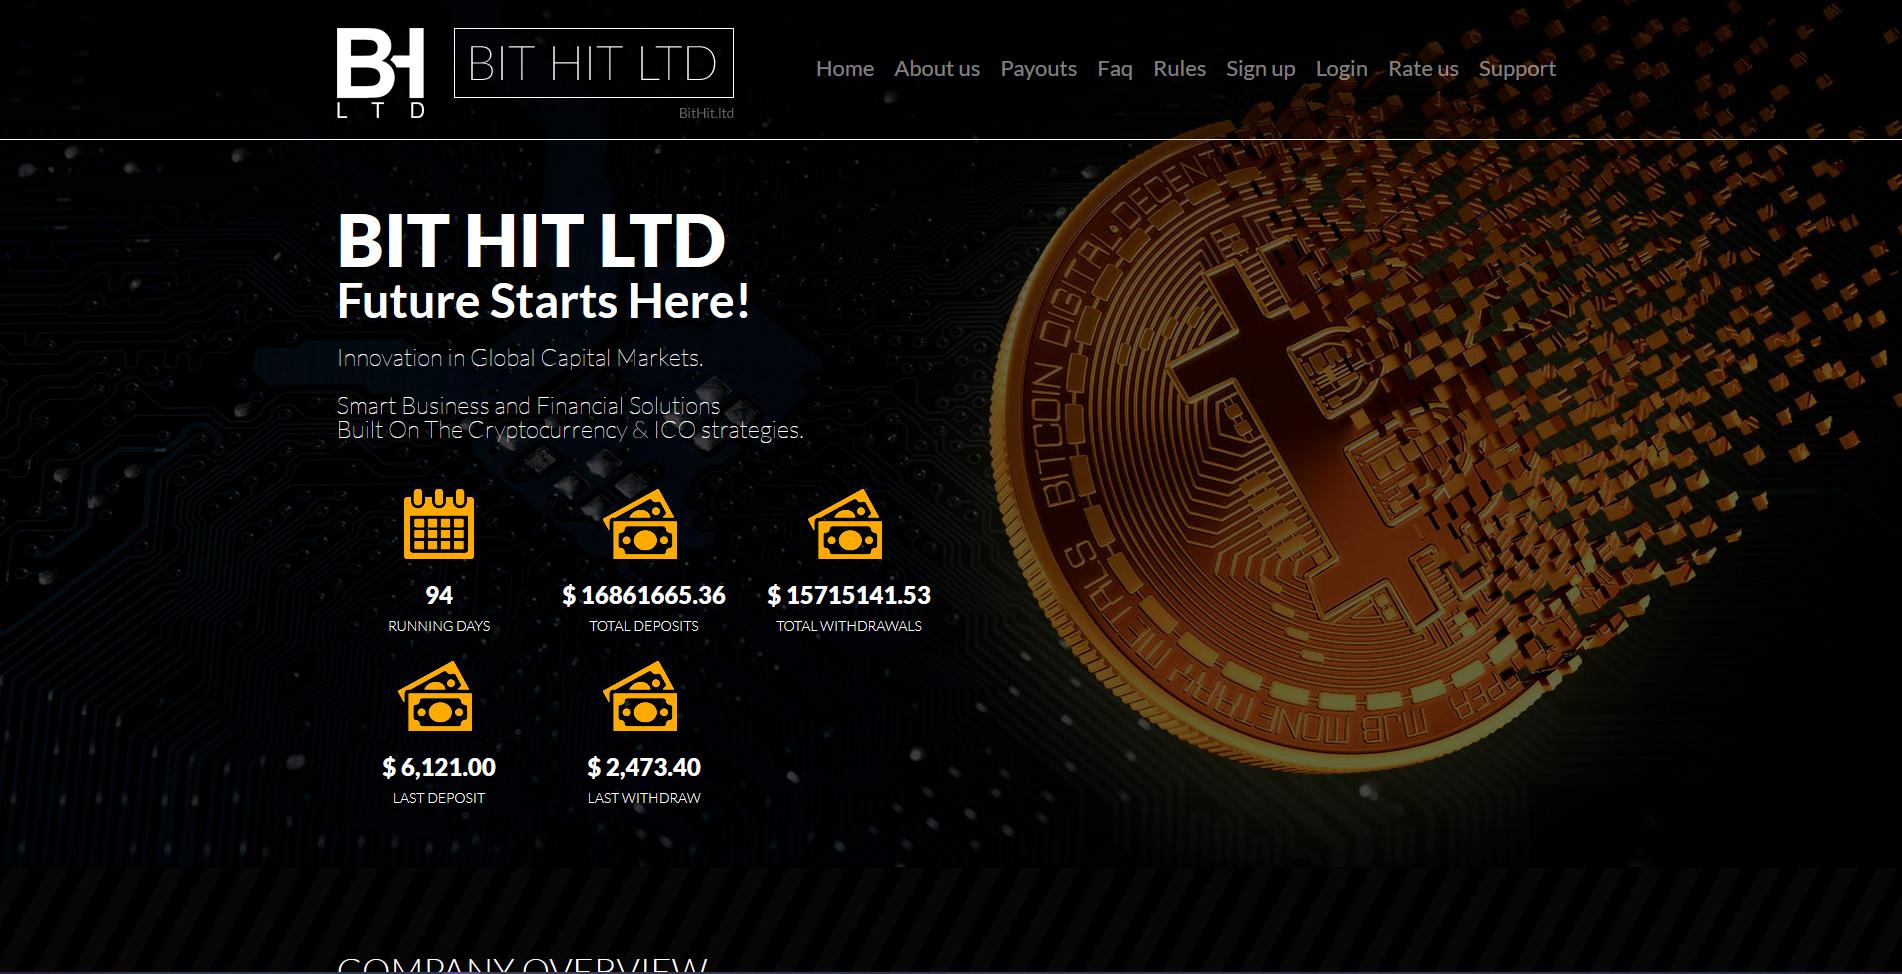 BitHit Ltd